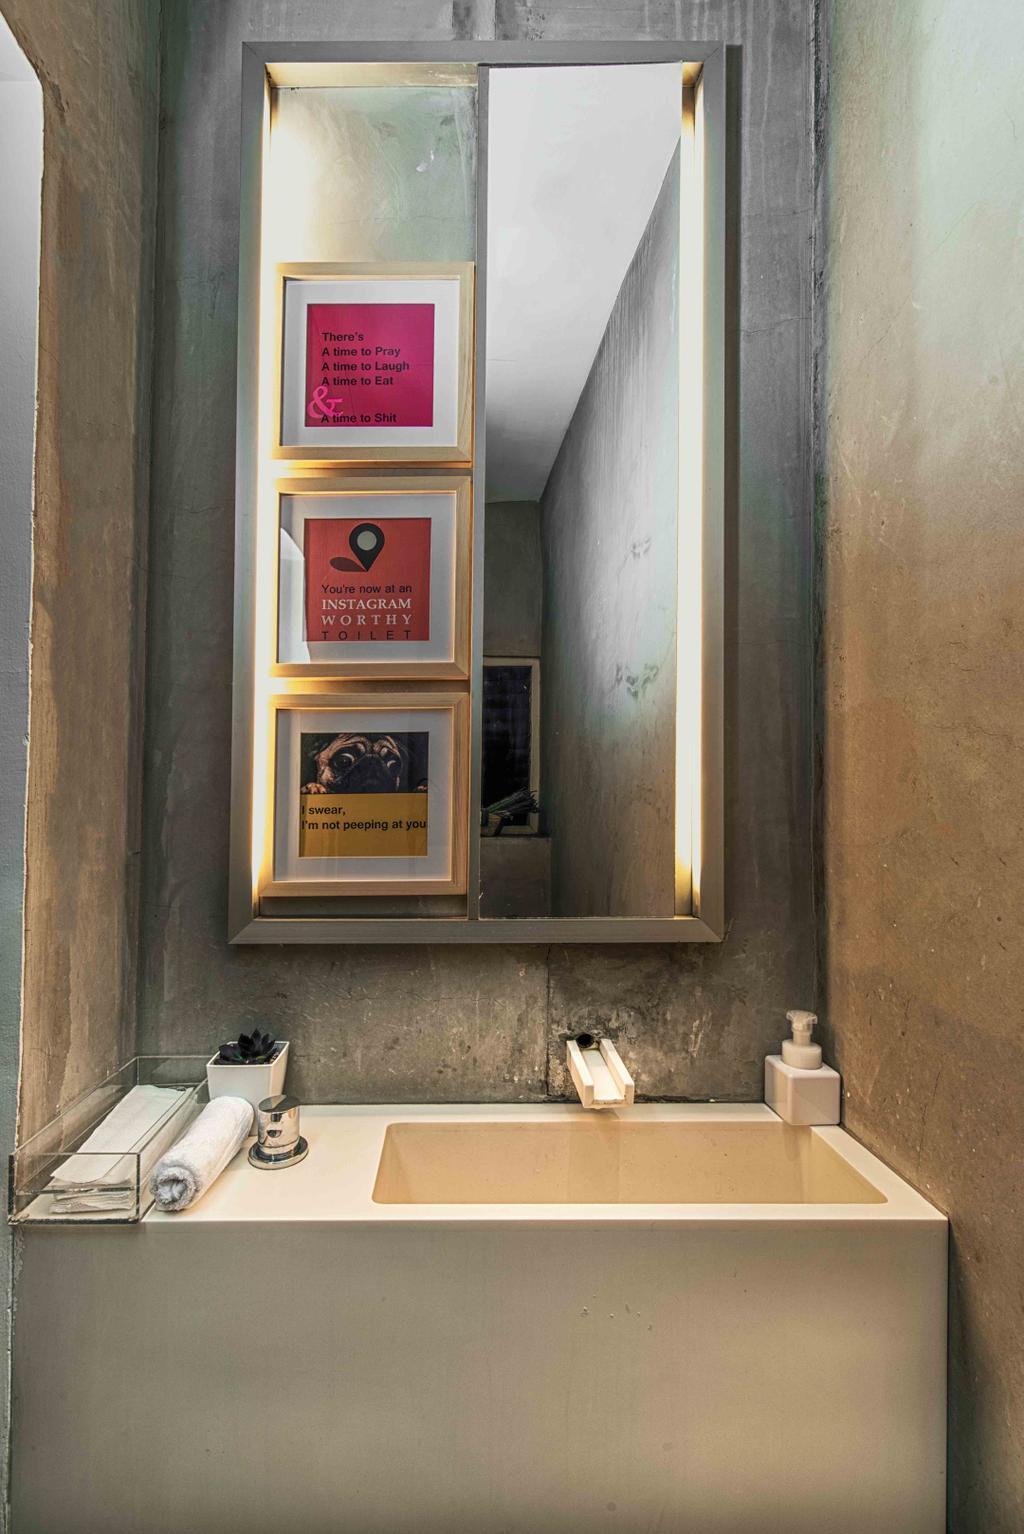 Salon, Commercial, Interior Designer, Mr Shopper Studio, Eclectic, Scandinavian, Retro